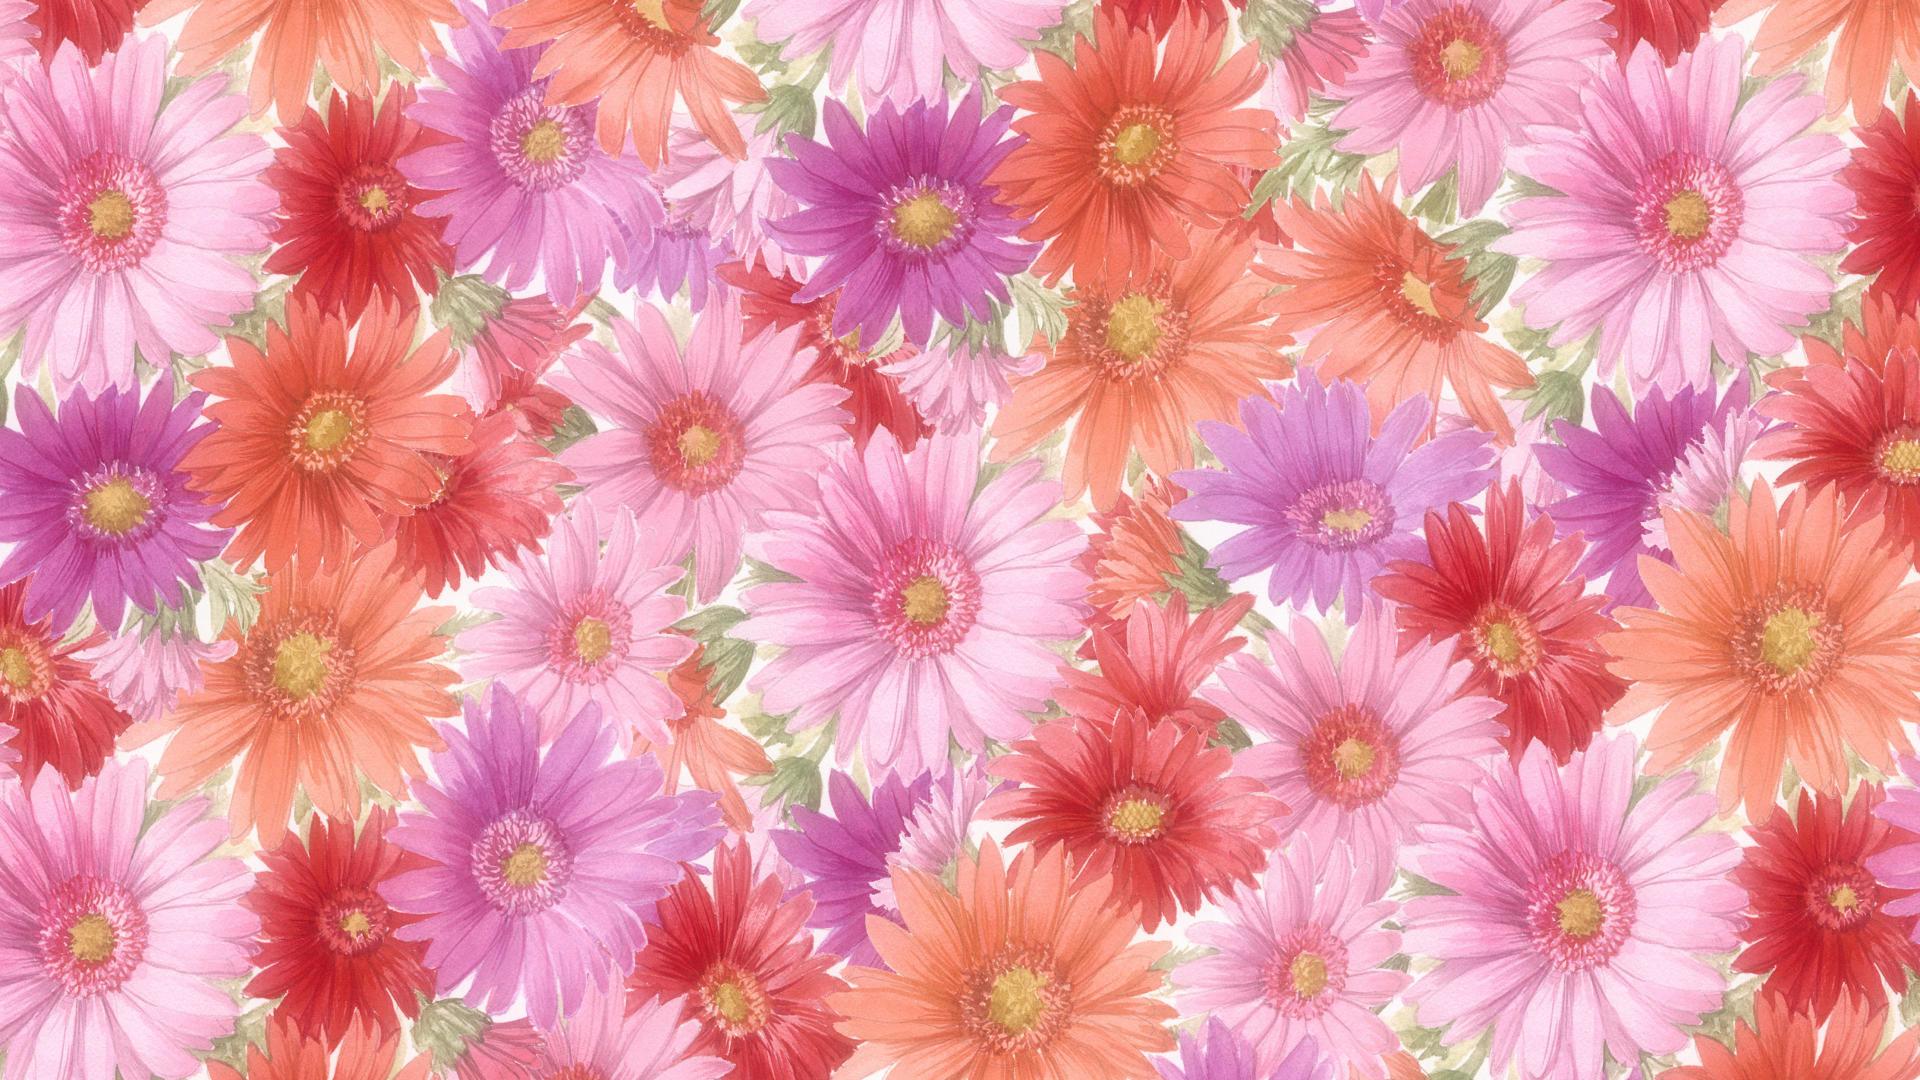 Flowers Wallpaper 155, Free Wallpapers, Free Desktop Wallpapers, HD .